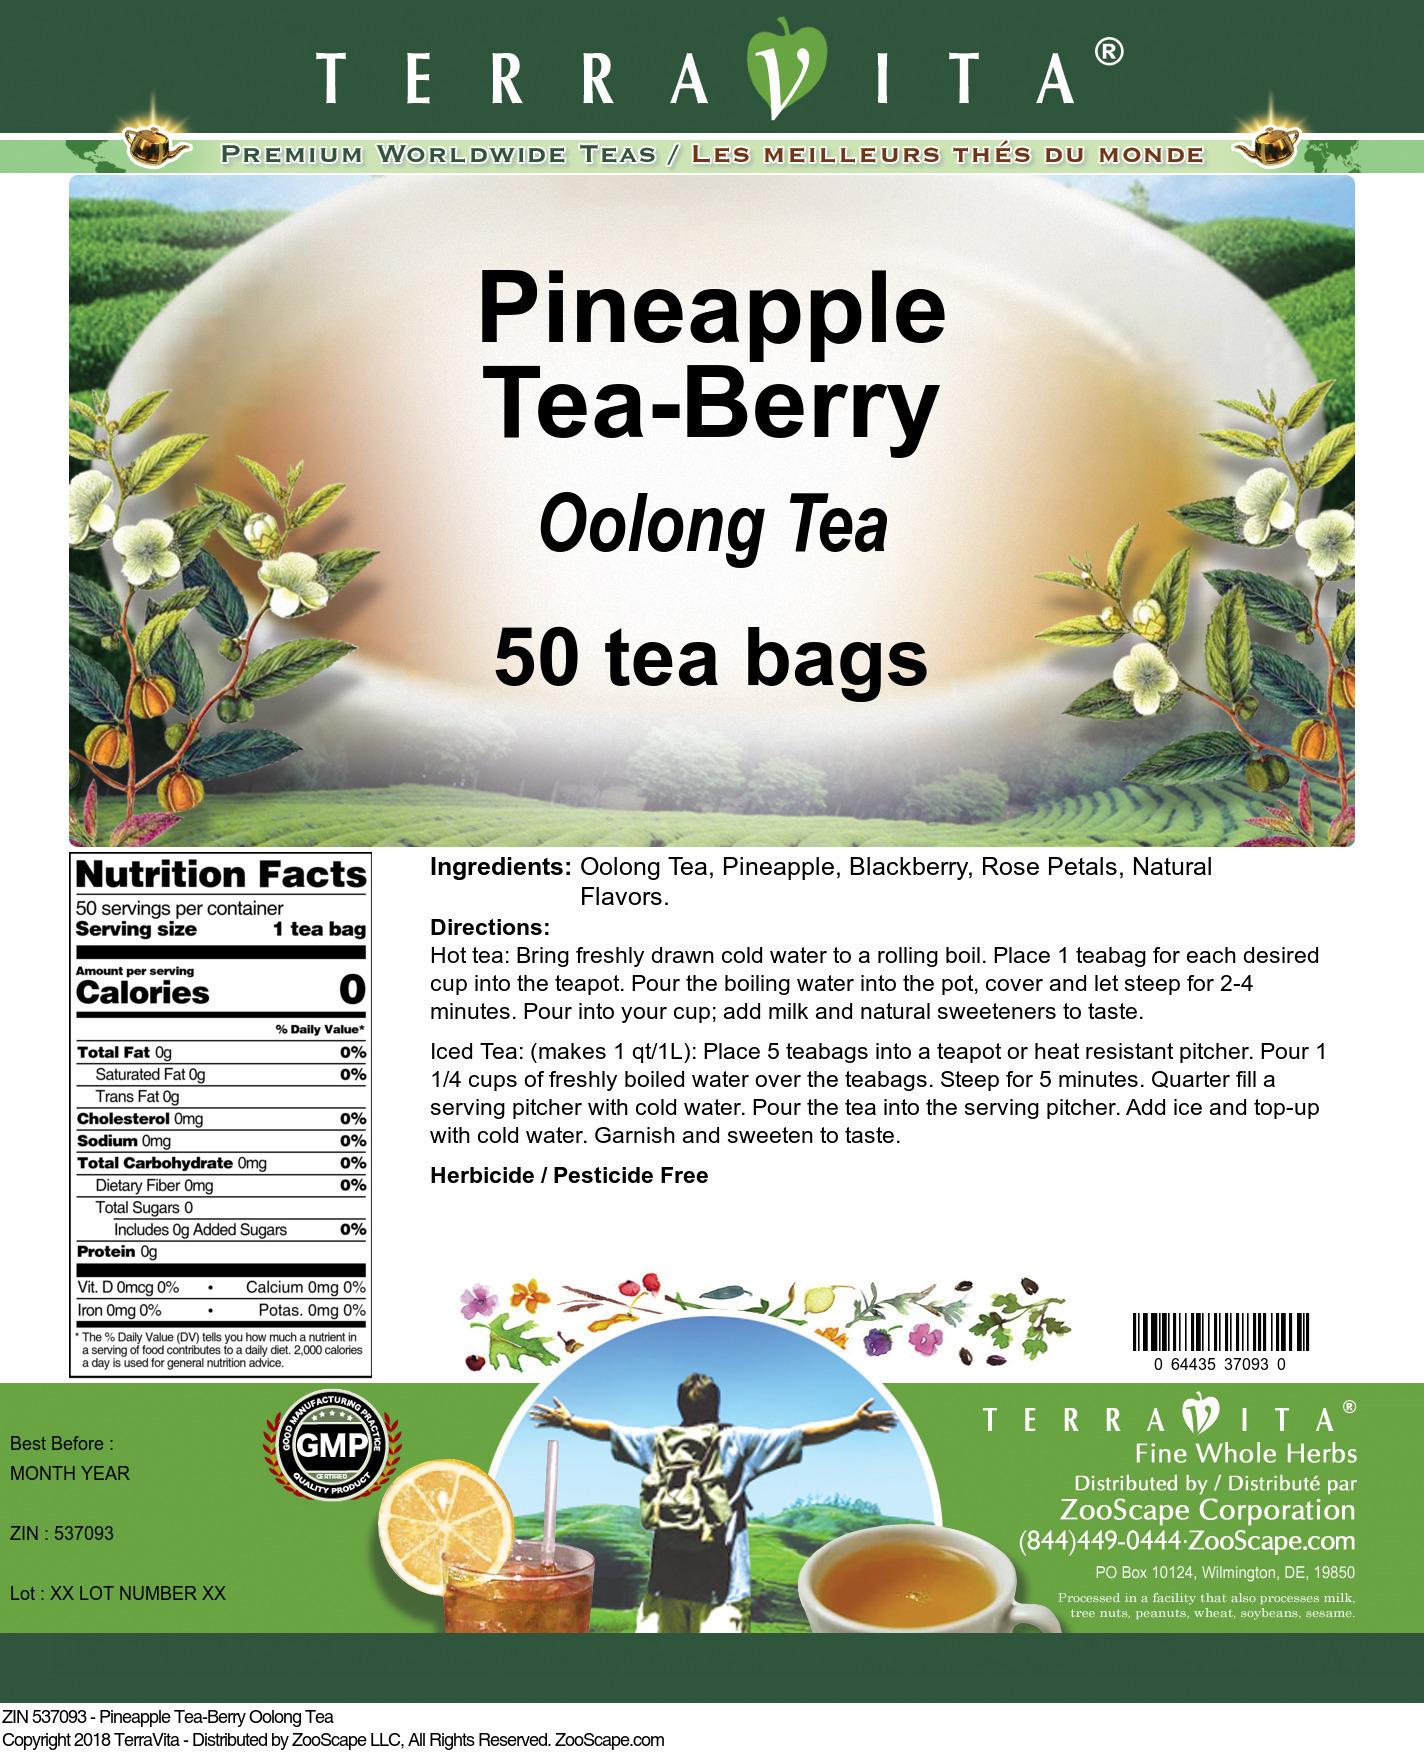 Pineapple Tea-Berry Oolong Tea